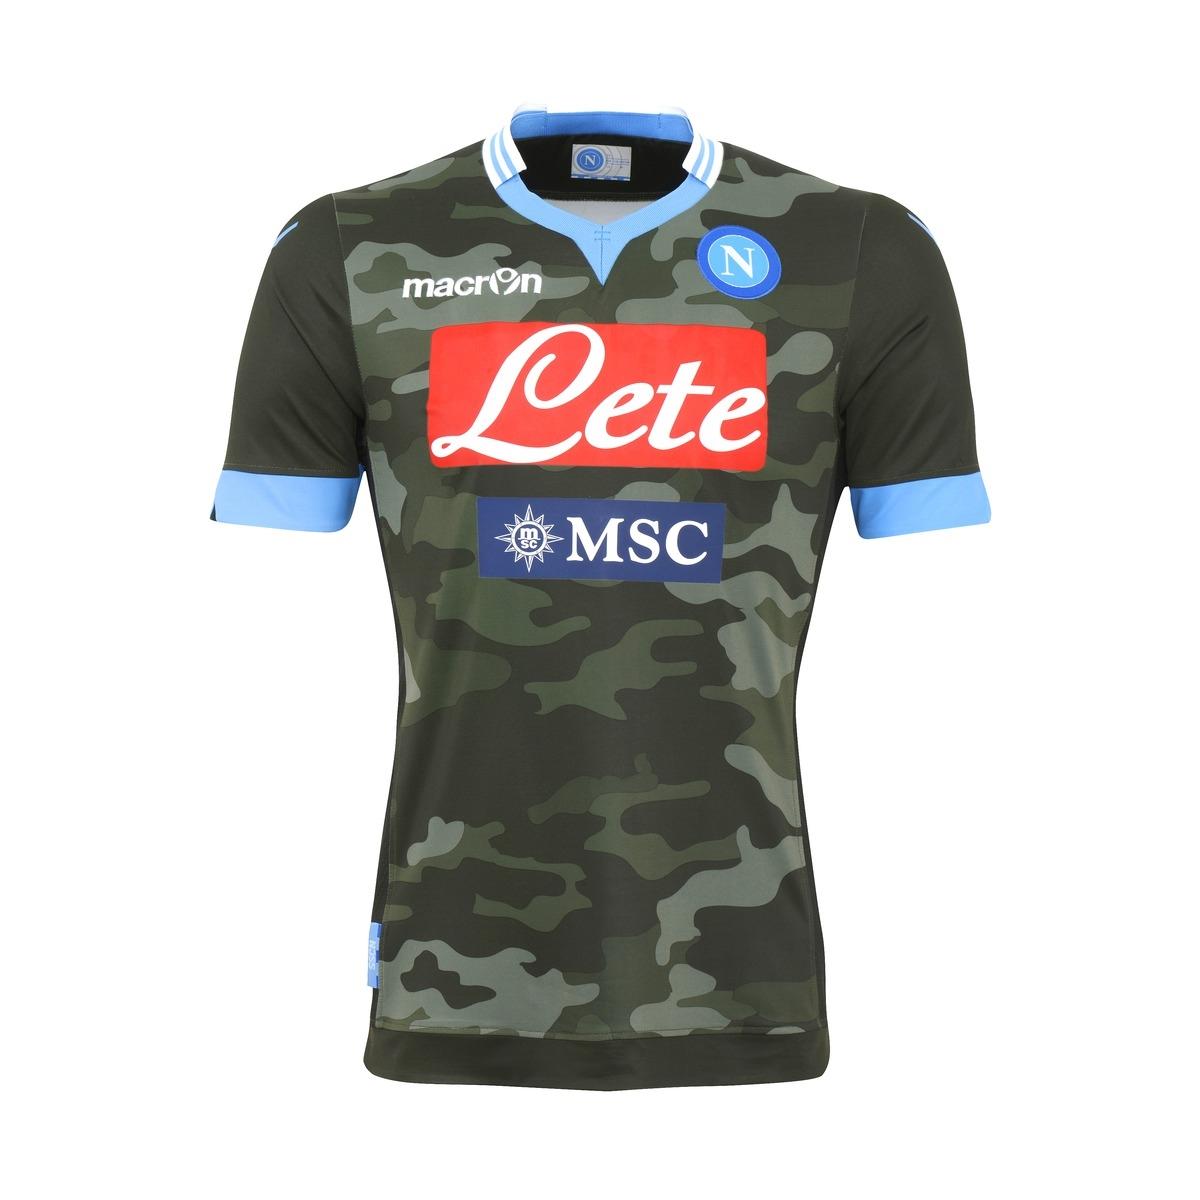 Camiseta camuflaje del Napoli 2013 - 2014